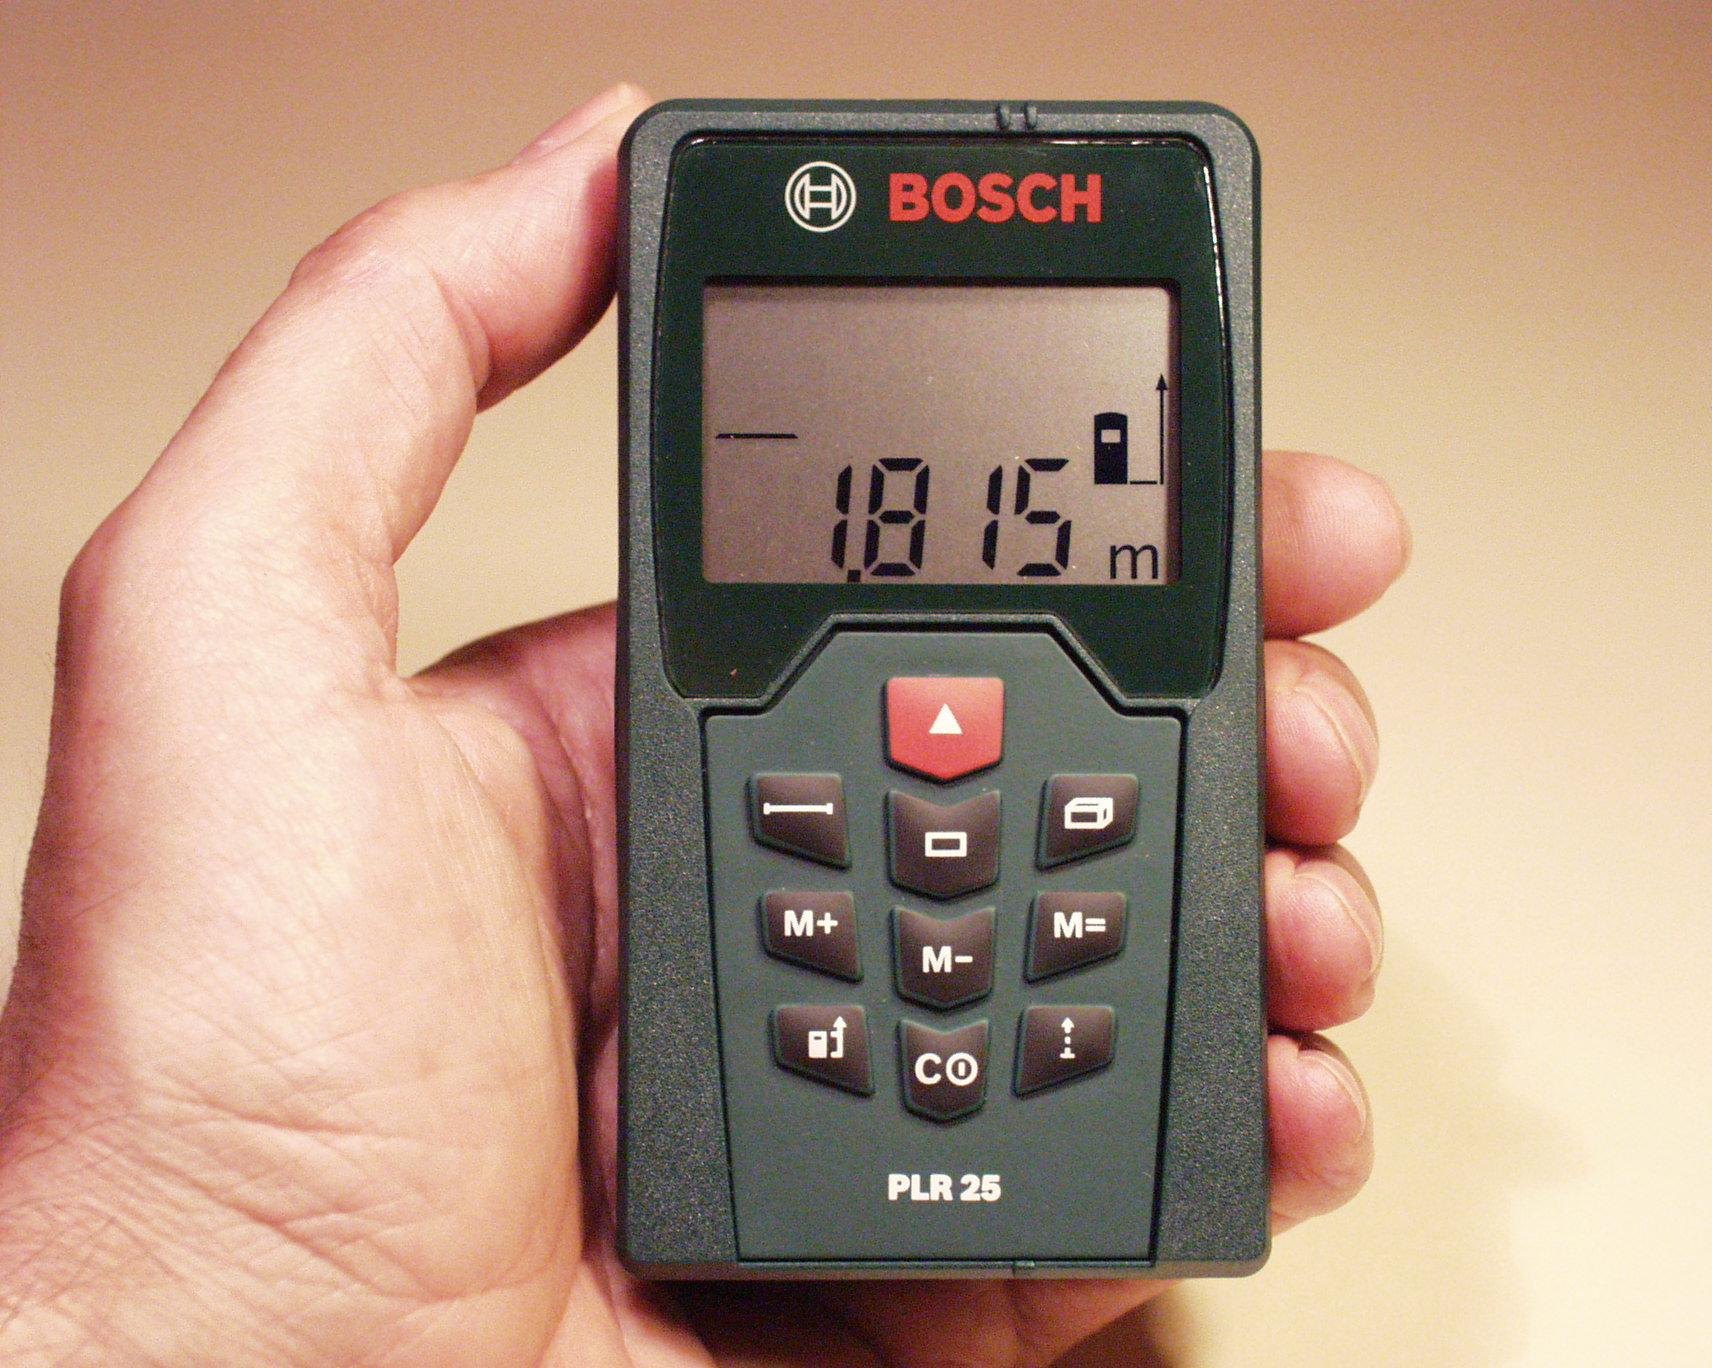 Bosch Entfernungsmesser Plr 25 : File bosch plr g wikimedia commons